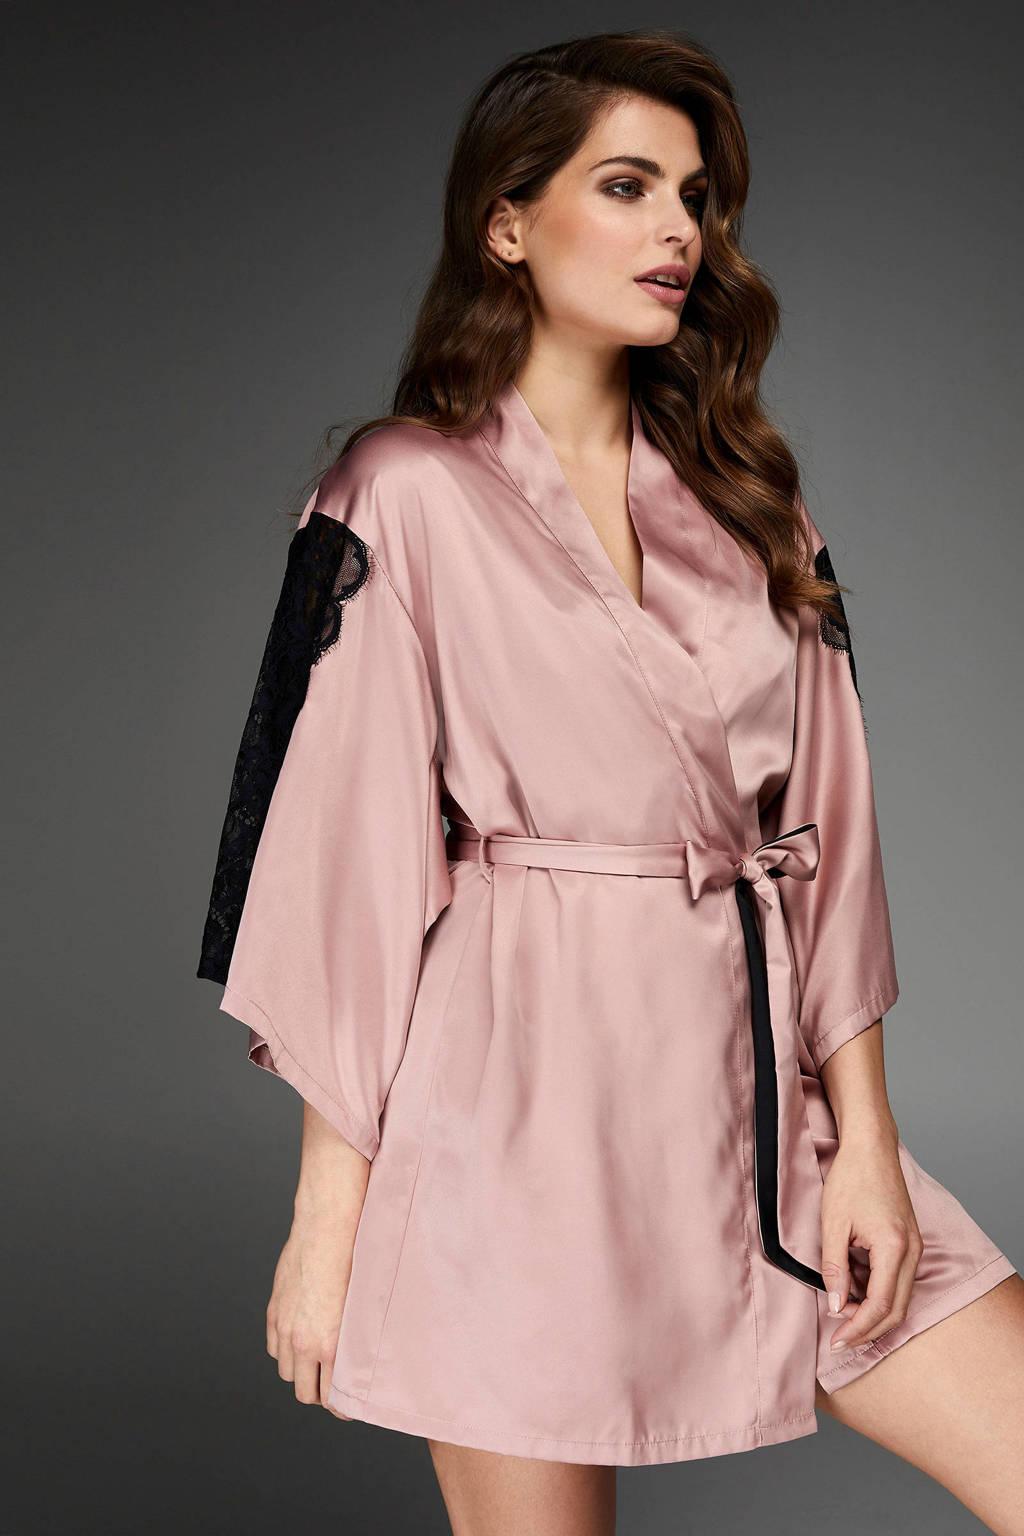 Hunkemöller kimono met kant oudroze/zwart, Oudroze/zwart